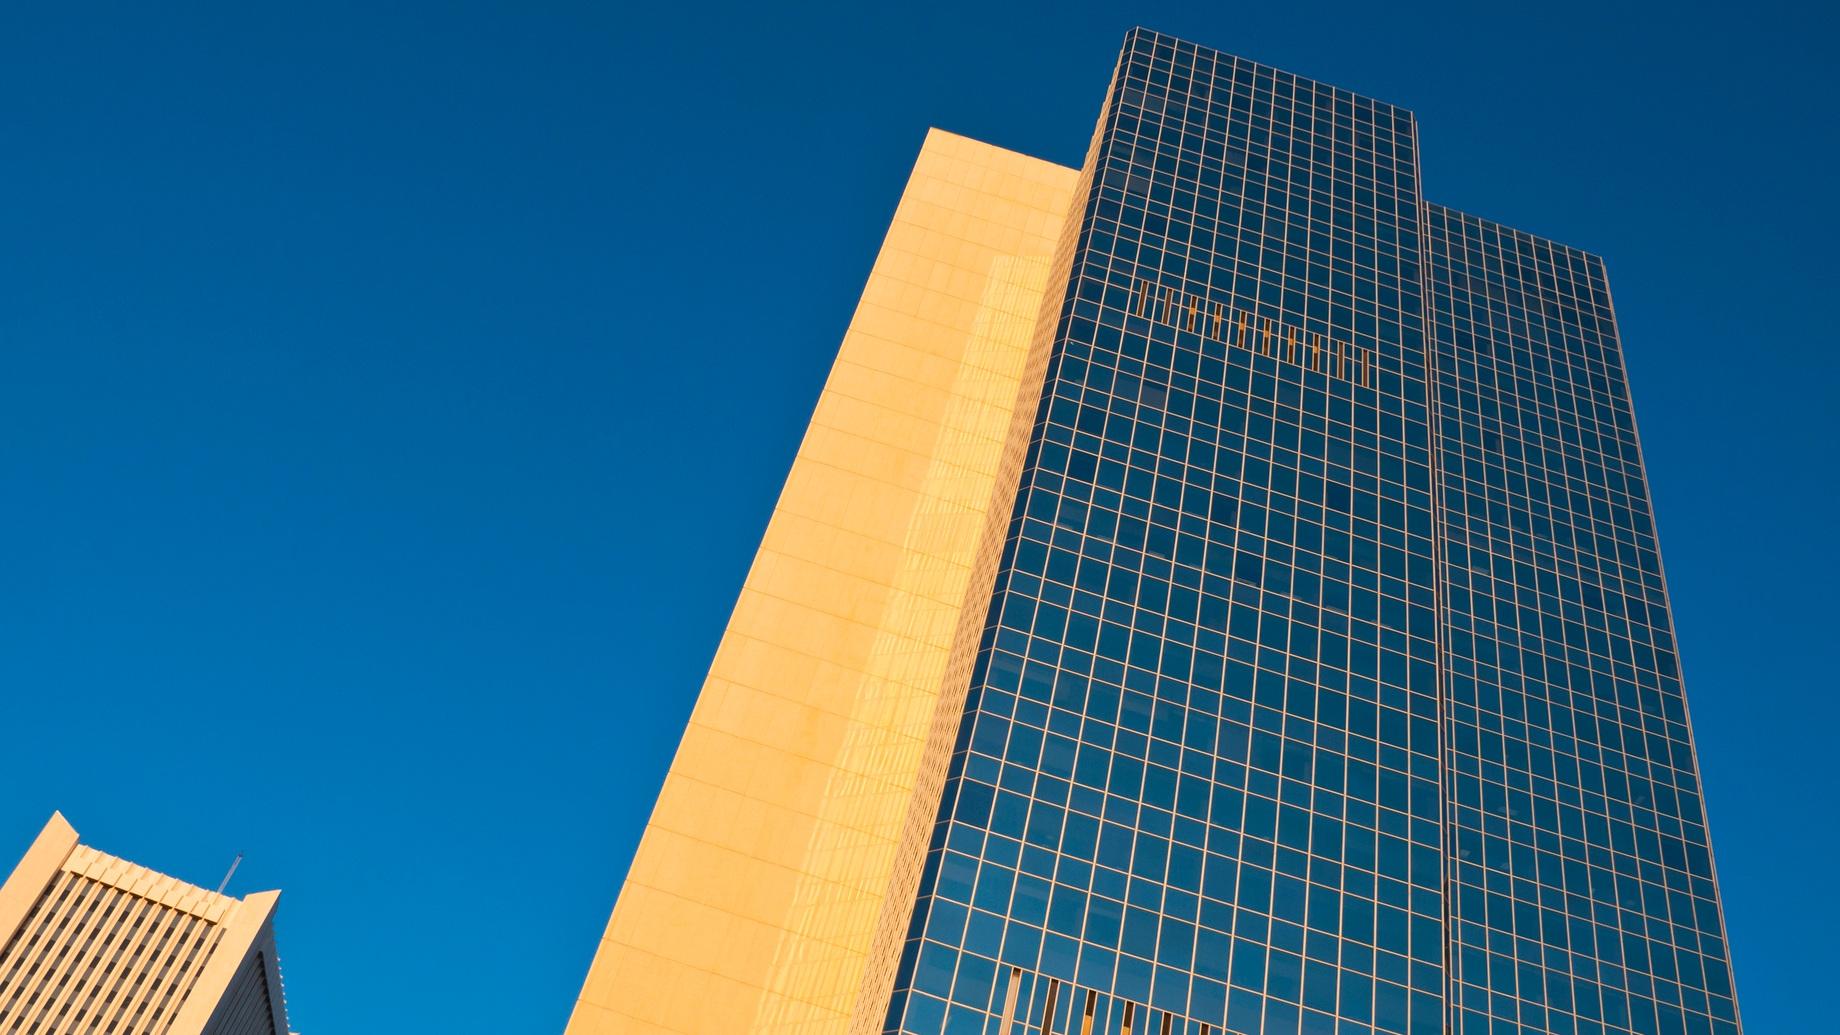 Chase Tower in Phoenix, AZ.